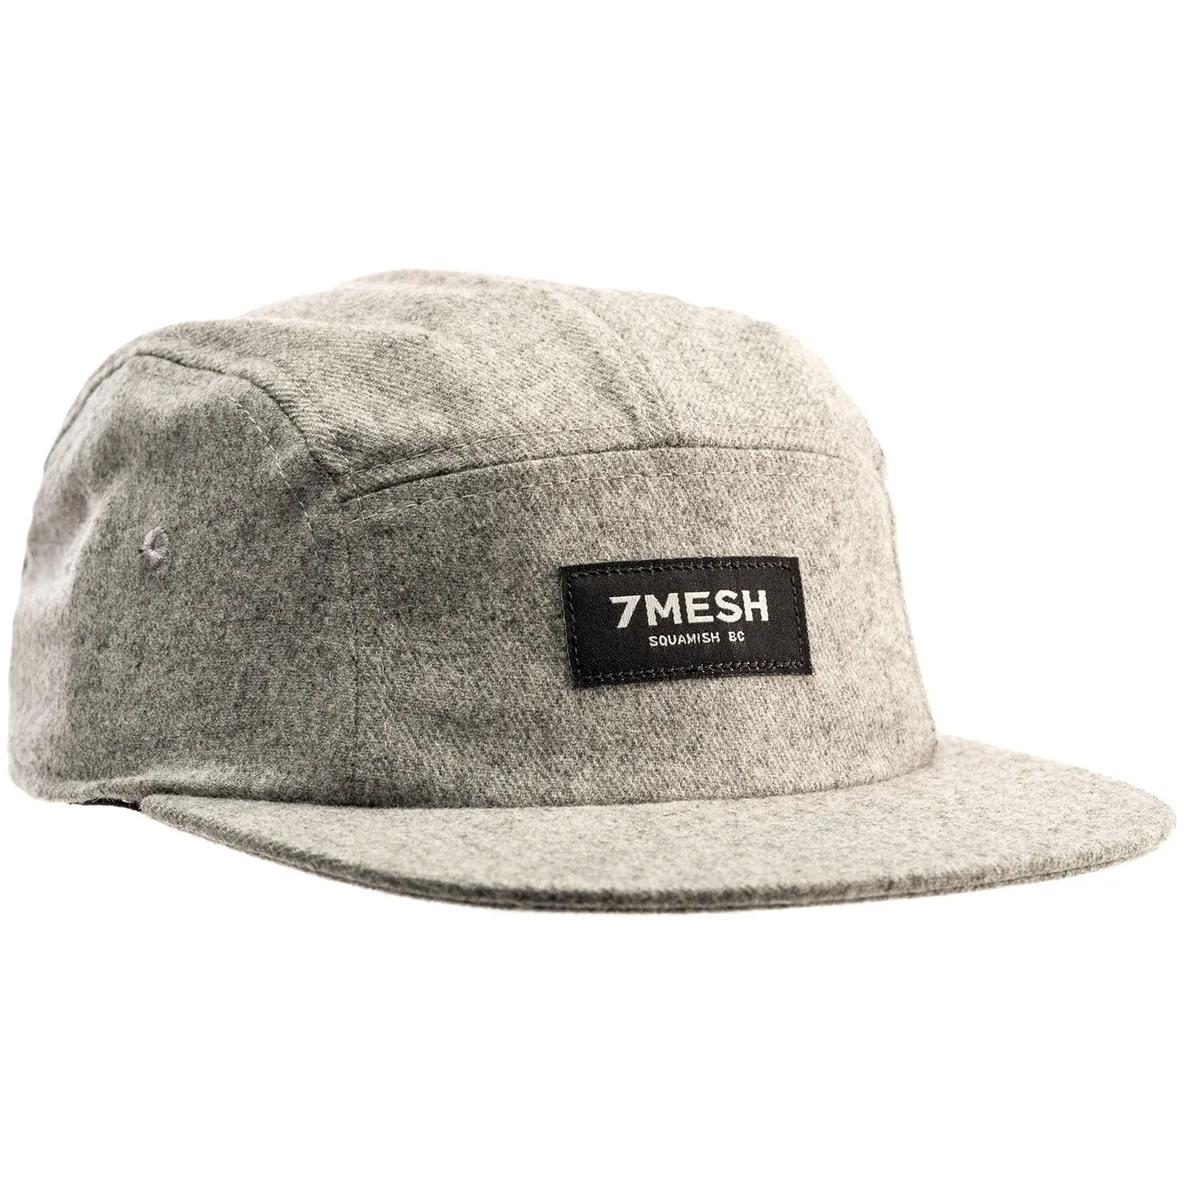 7mesh Trailside Flannel Gorra - Charcoal